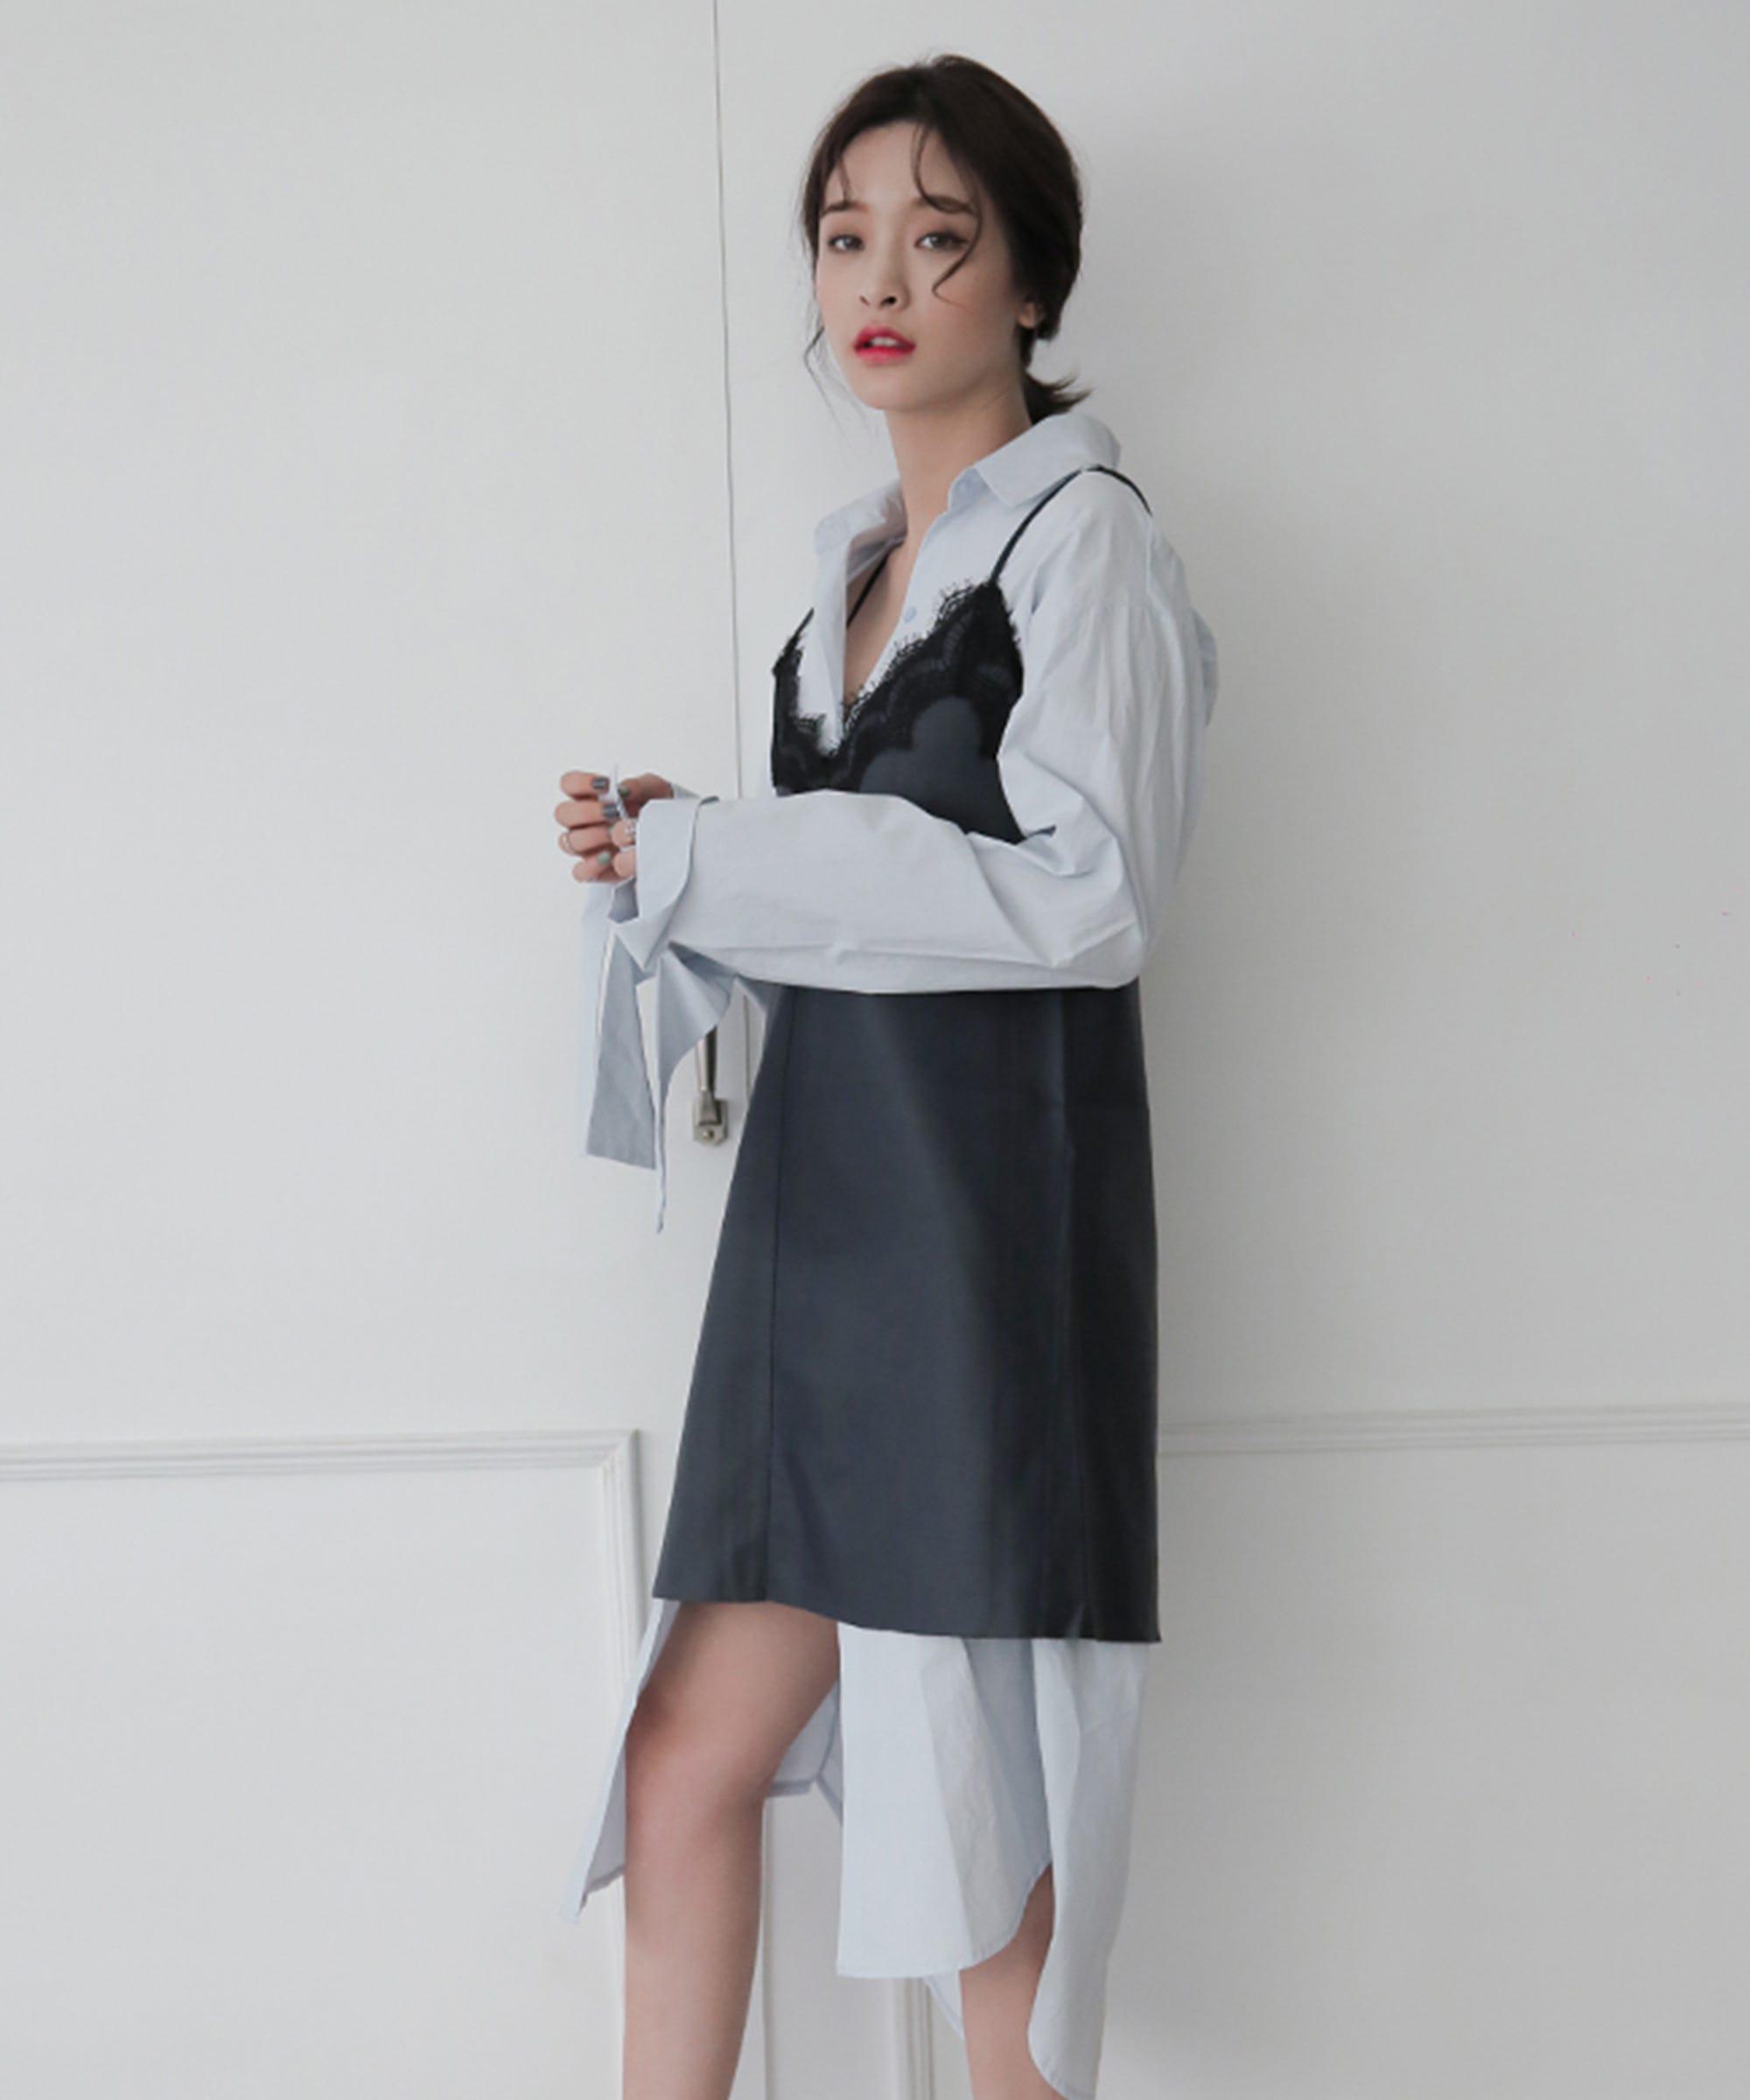 c4126f6c3fb Korean Fashion Stylenanda Outfits Fishnets Corset Belt